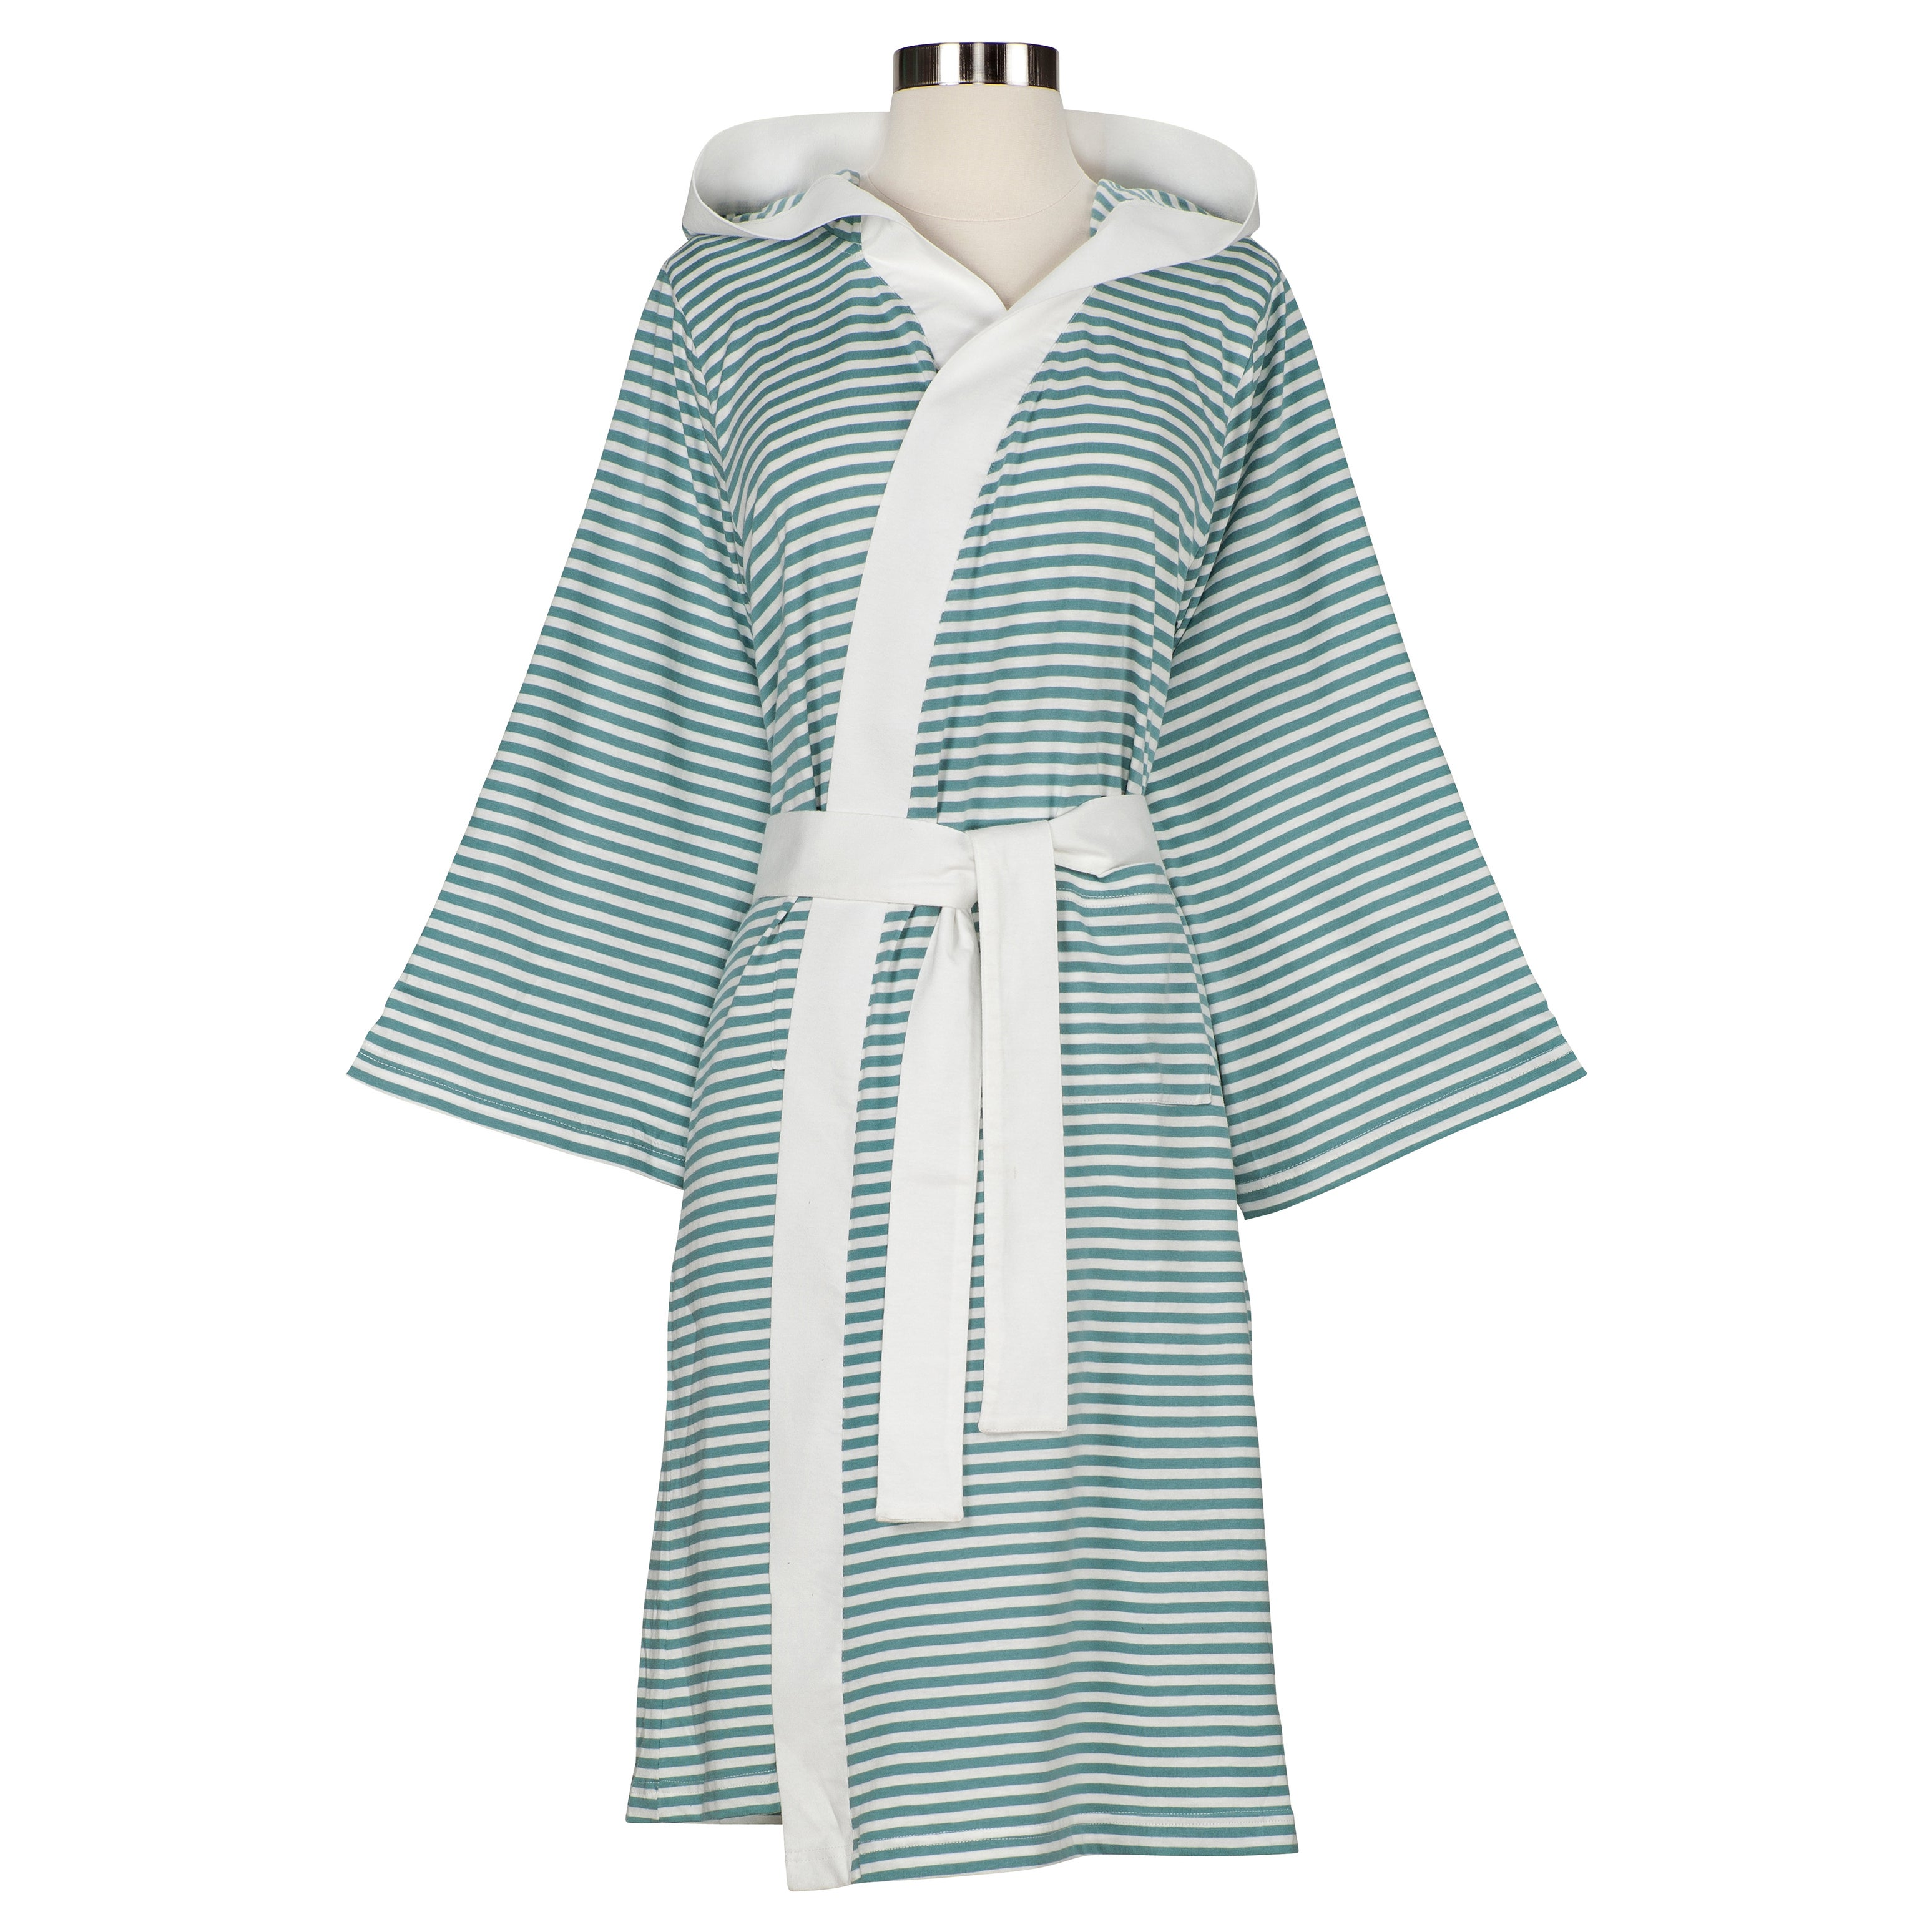 f29c8d1467 Shop Women s Organic Cotton Stripe Bath Robe - On Sale - Free Shipping  Today - Overstock.com - 7458364